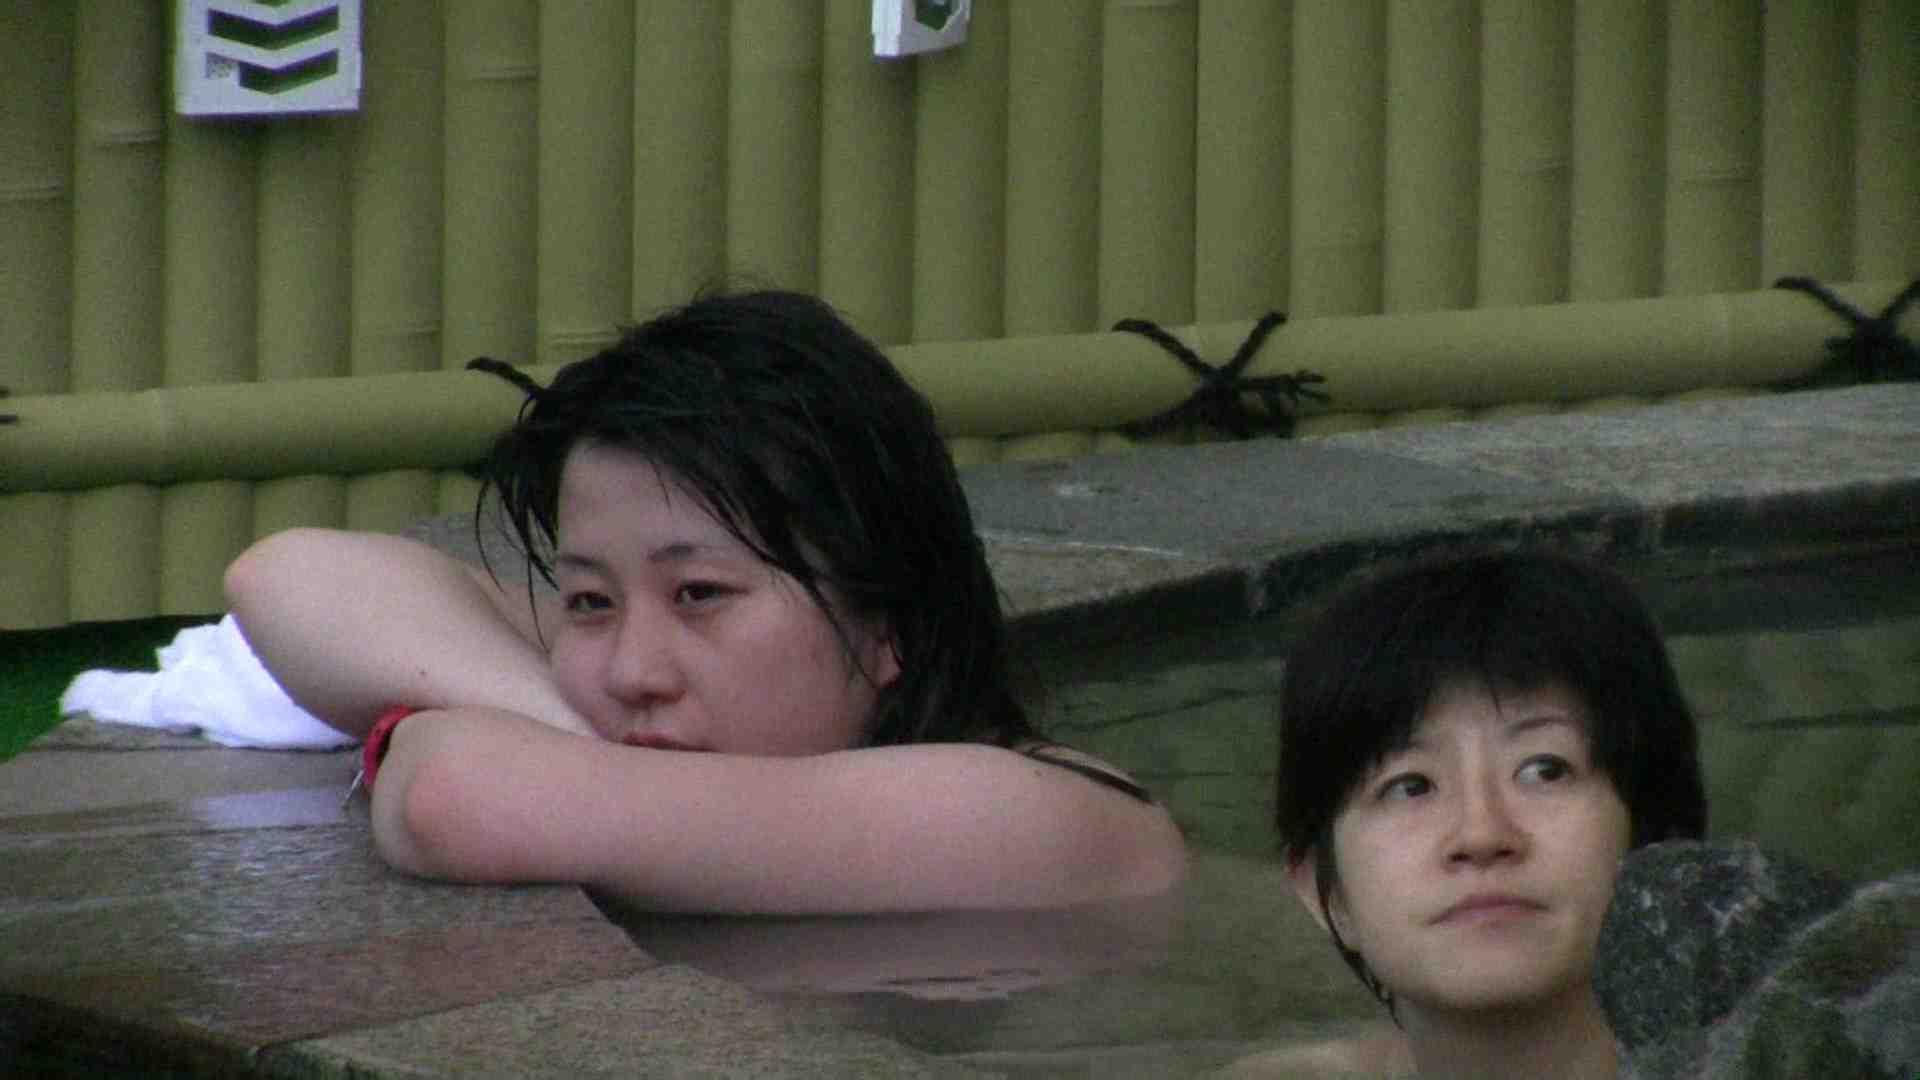 Aquaな露天風呂Vol.541 露天風呂編 | 盗撮シリーズ  88PIX 67